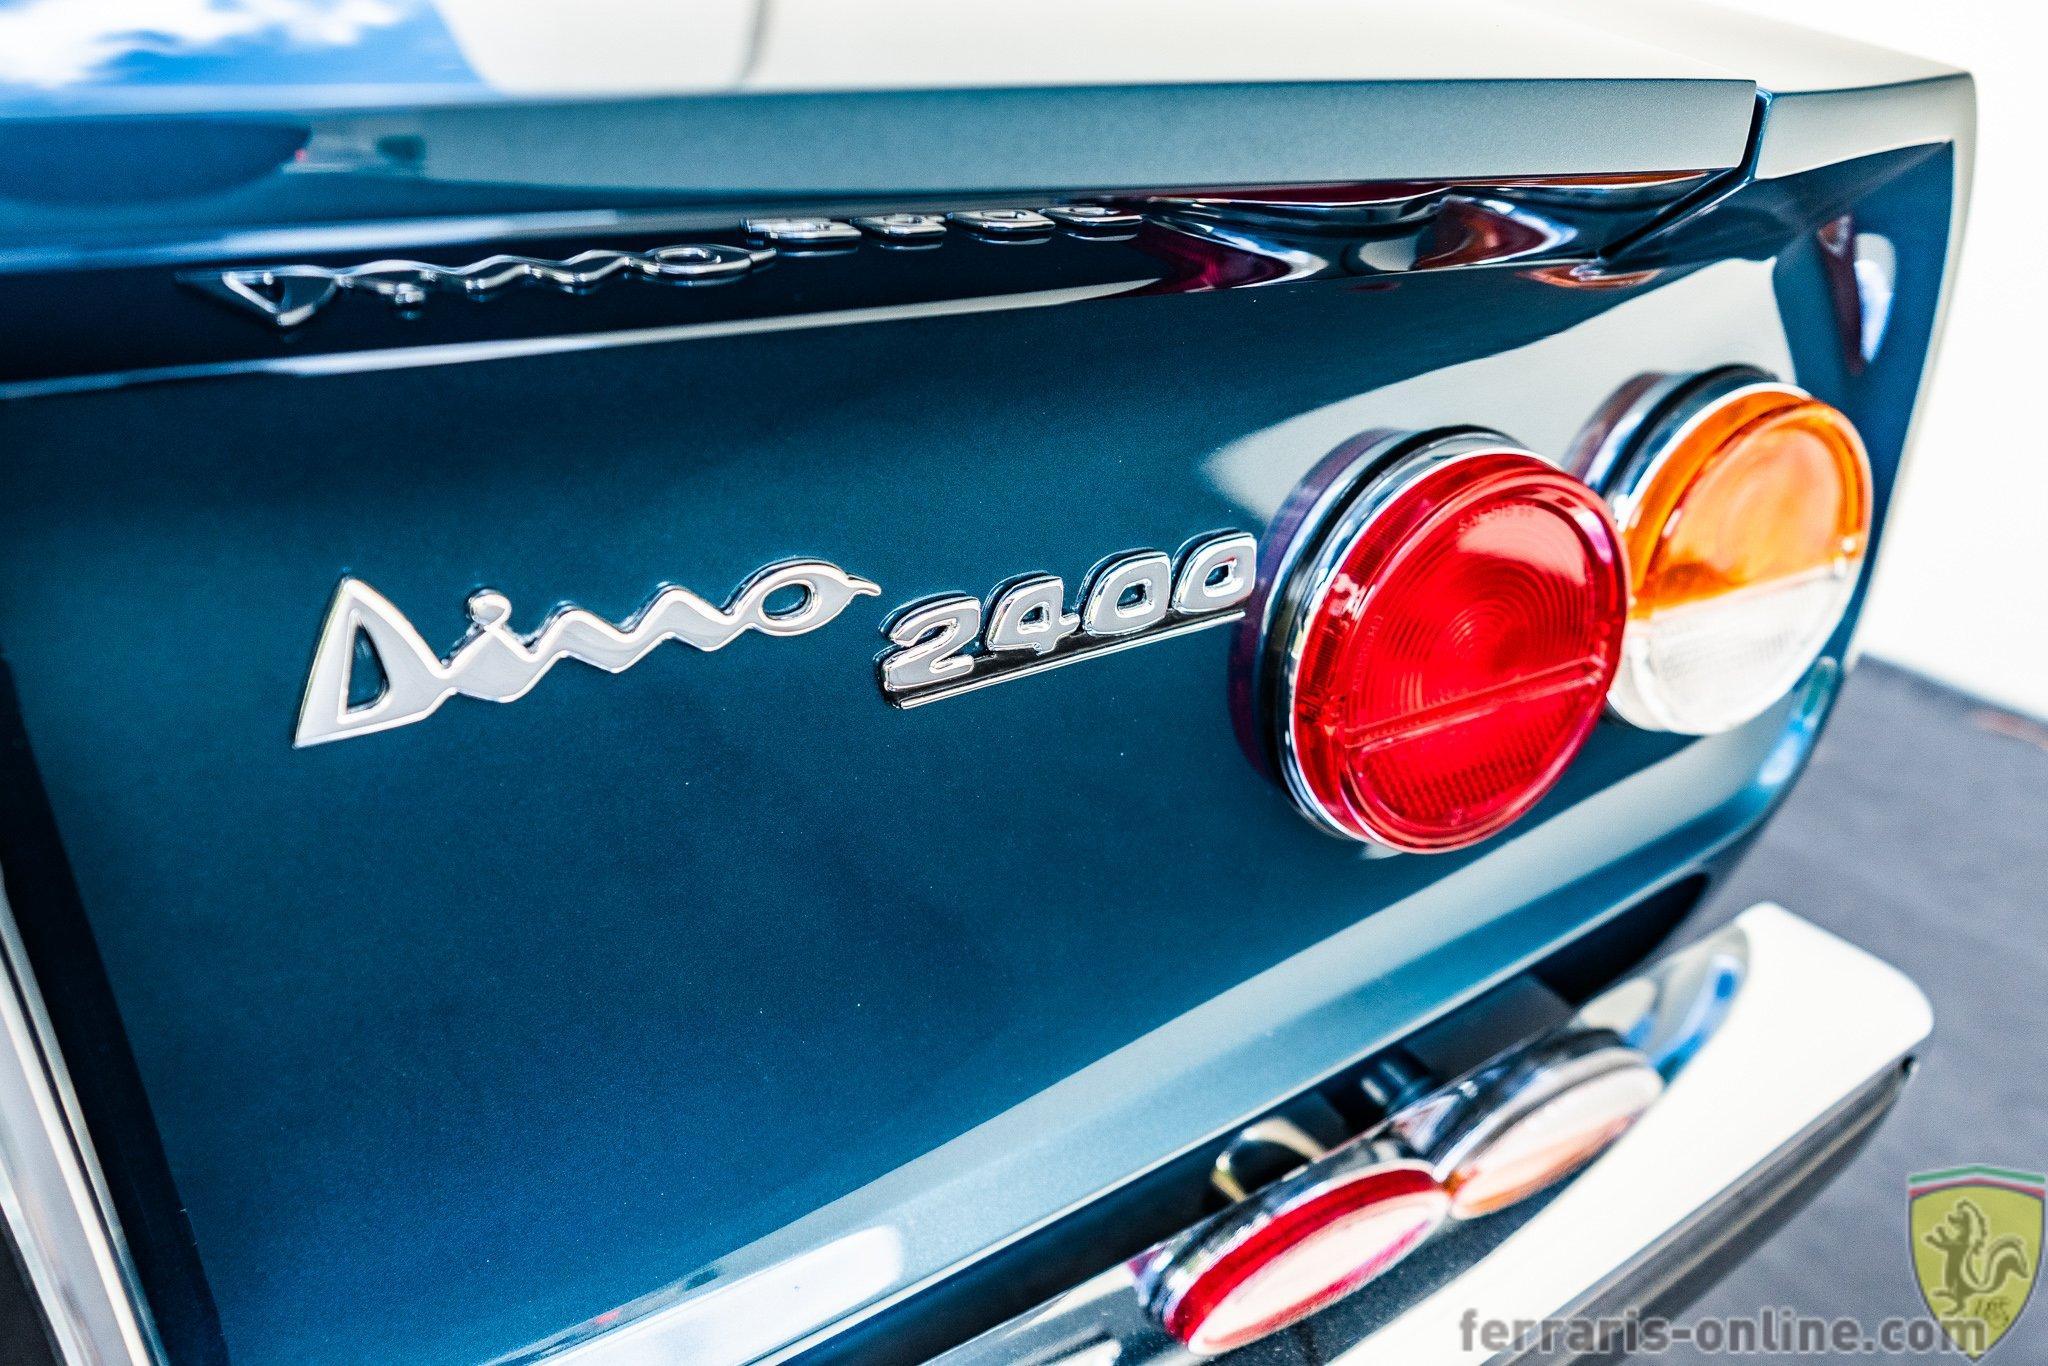 1971 Fiat Dino Spyder #01516